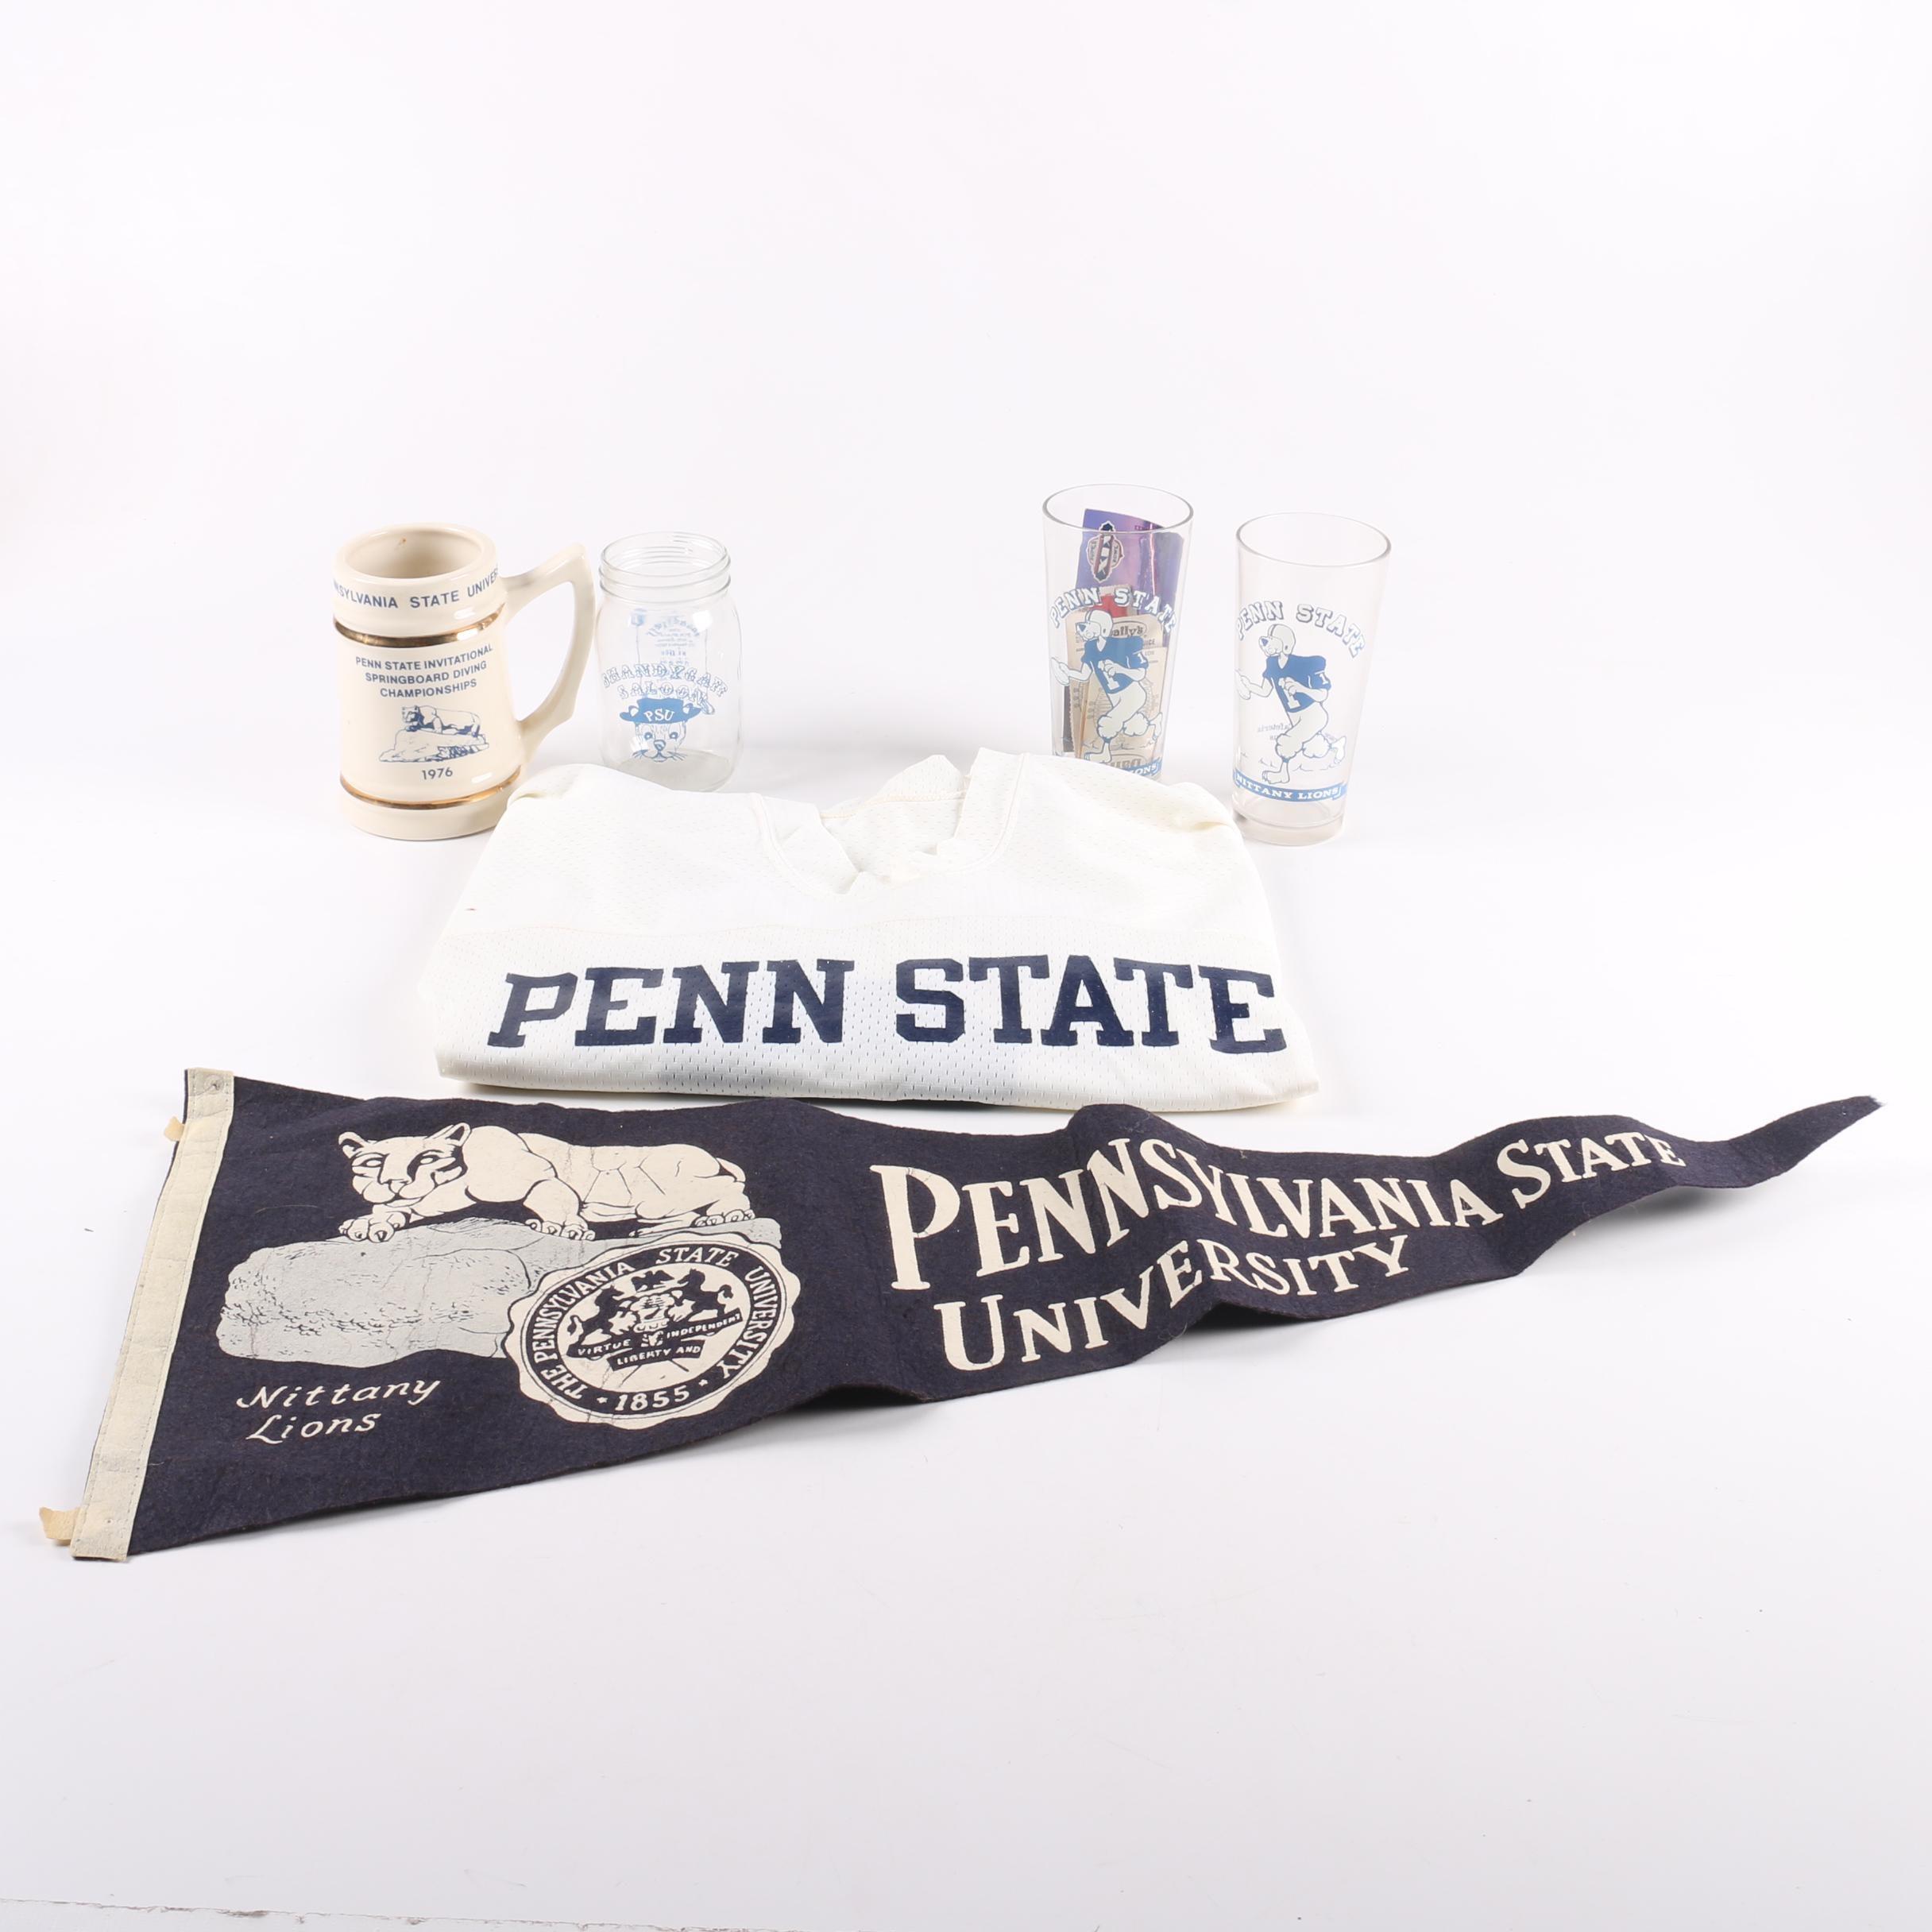 Penn State University Memorabilia